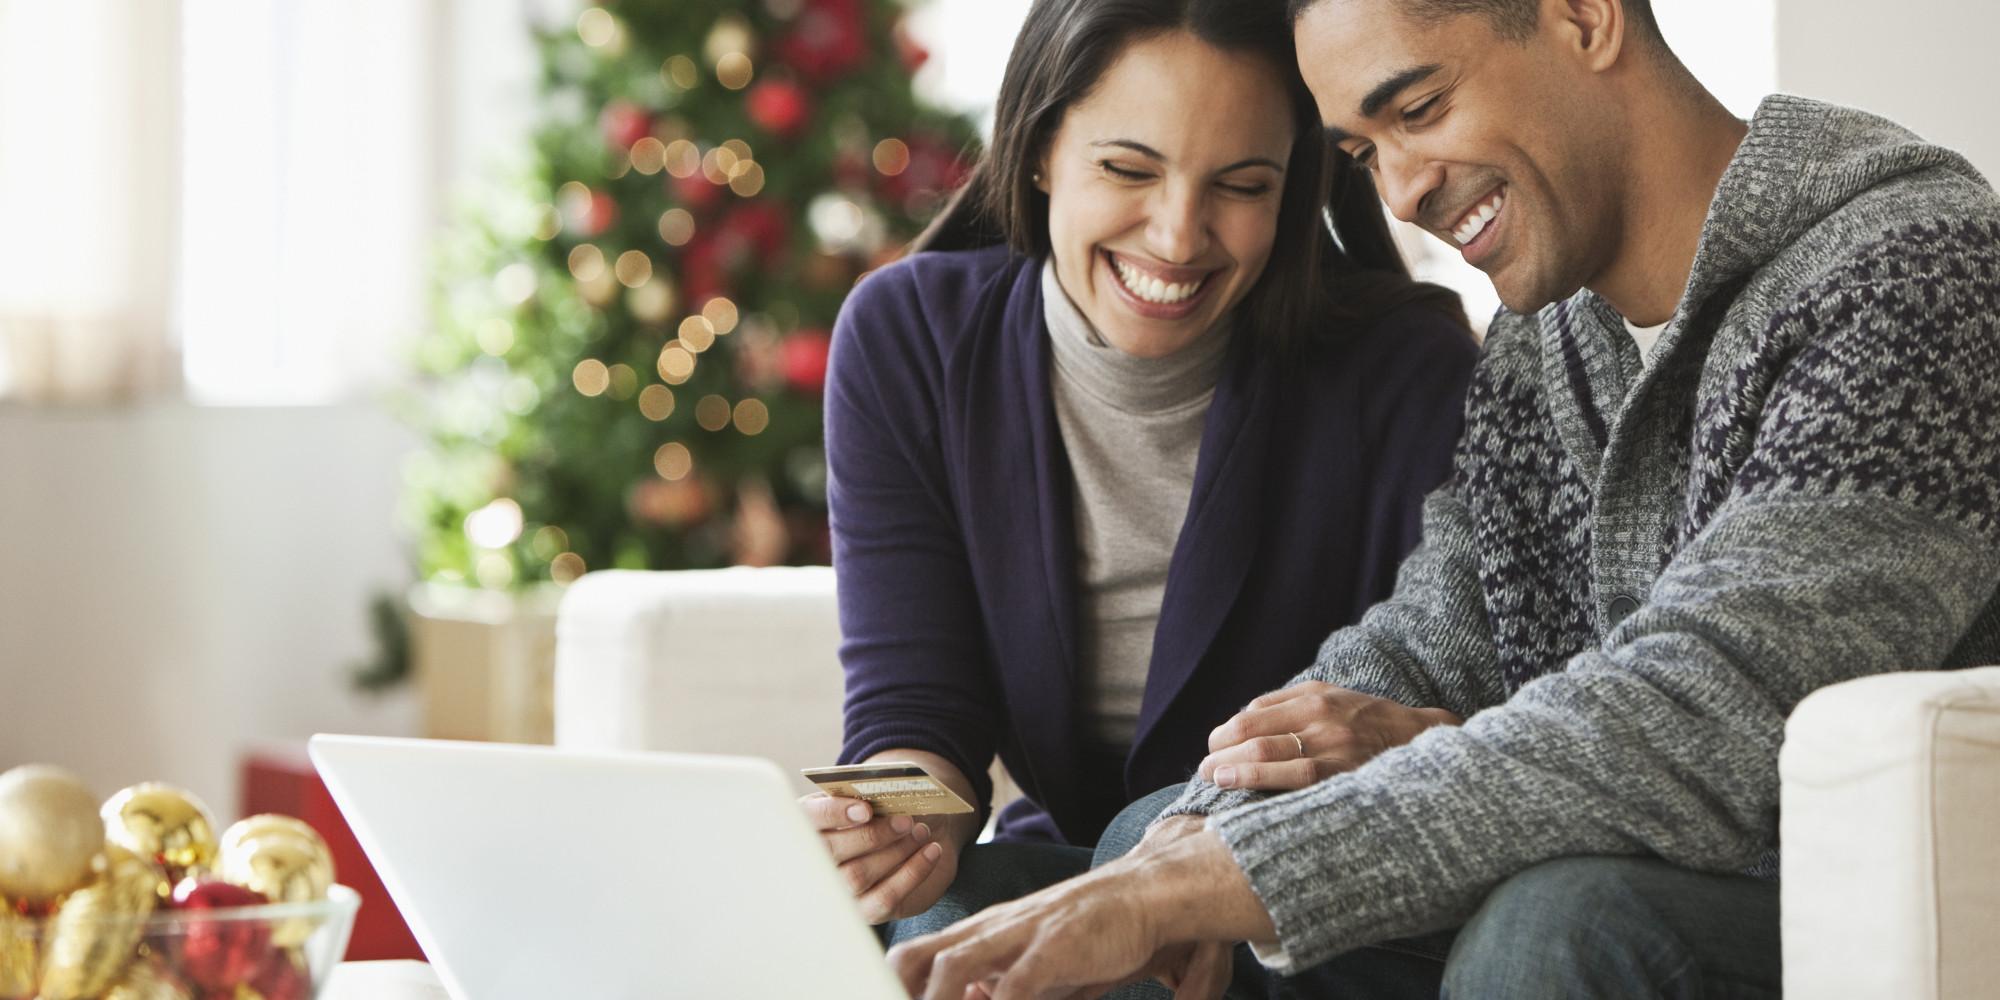 Best Online Shopping Sites Top 10 Websites To Find